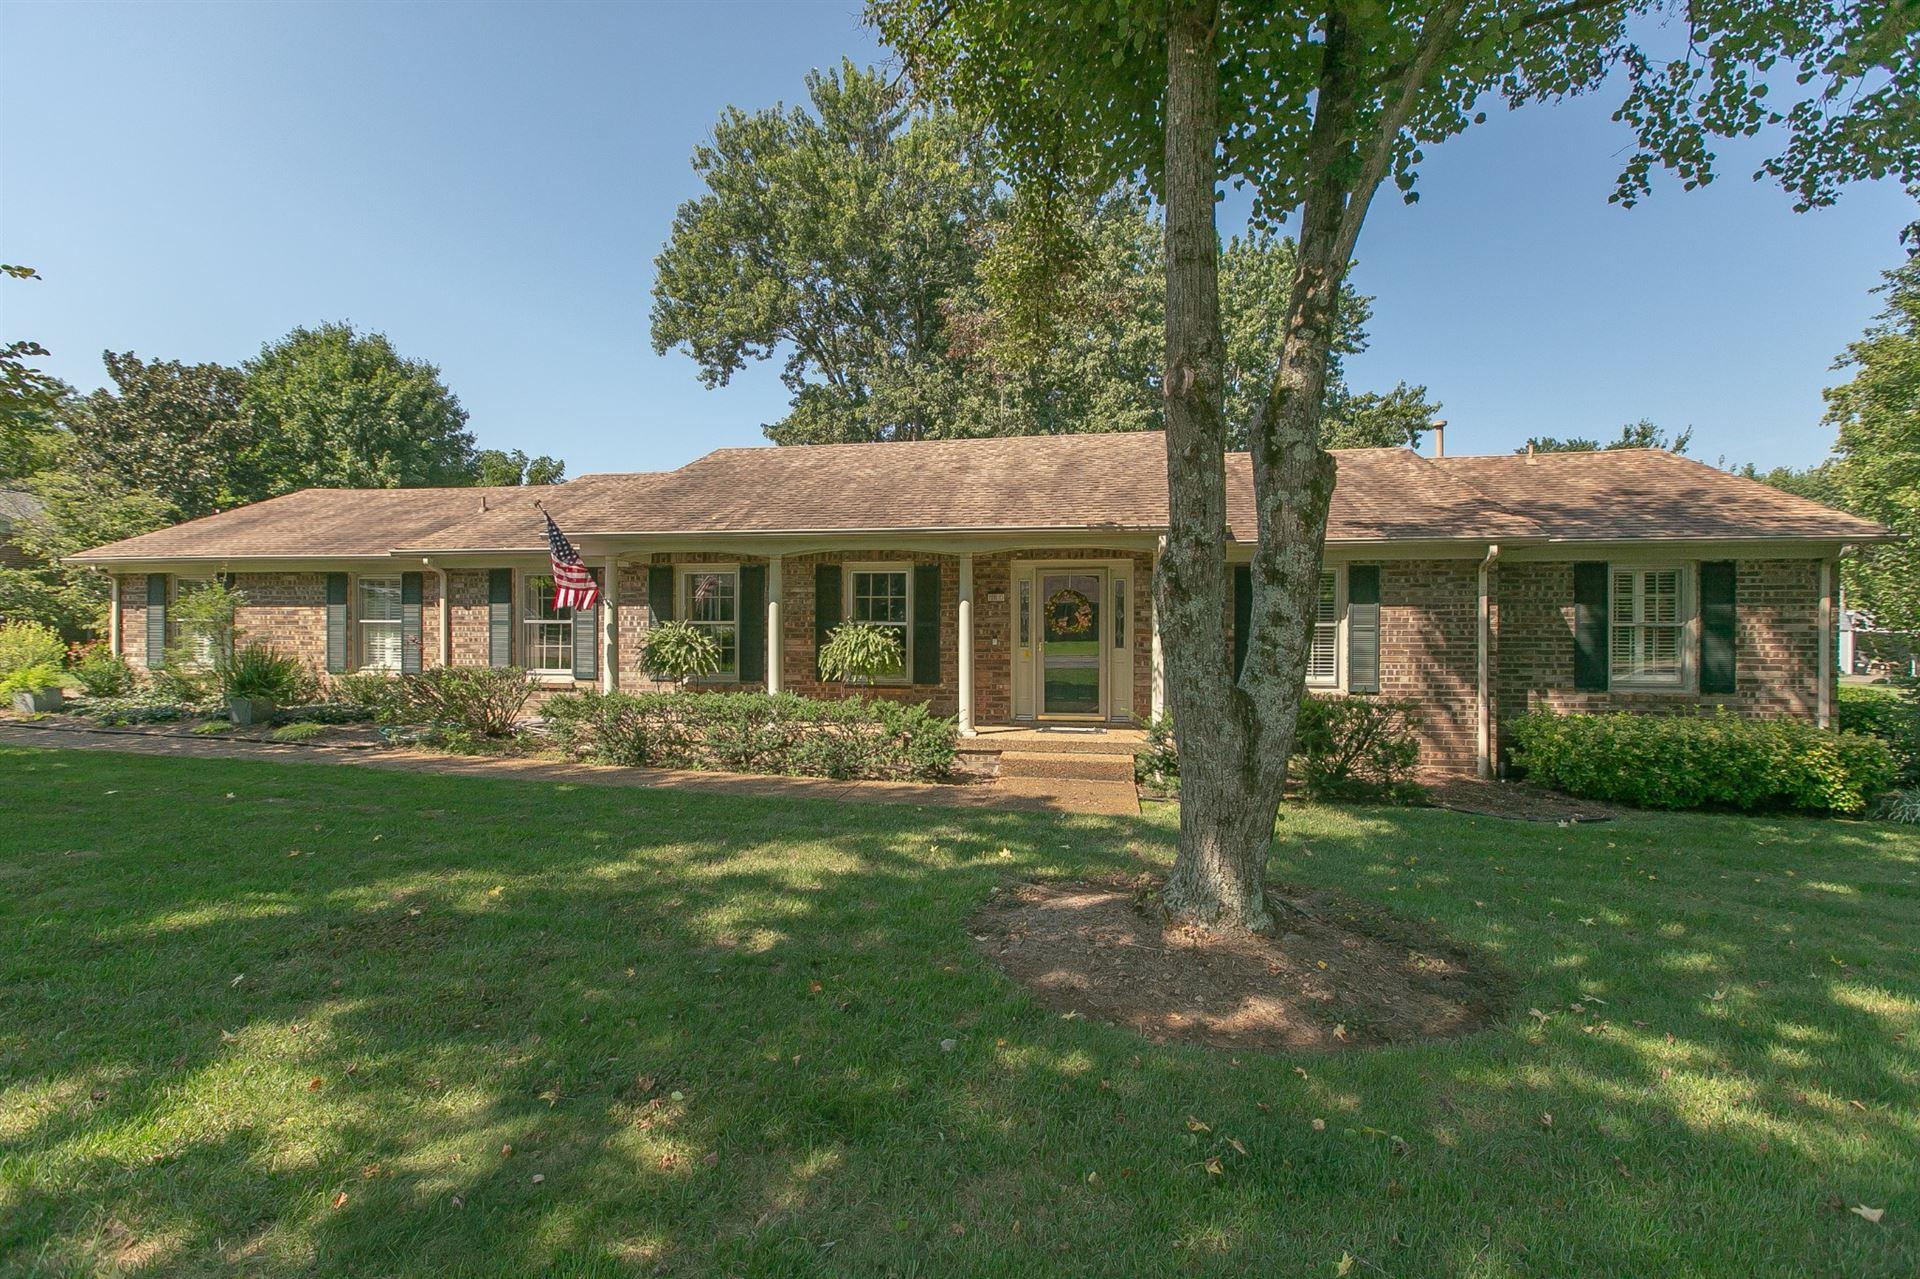 Photo of 2323 London Ave, Murfreesboro, TN 37129 (MLS # 2291952)